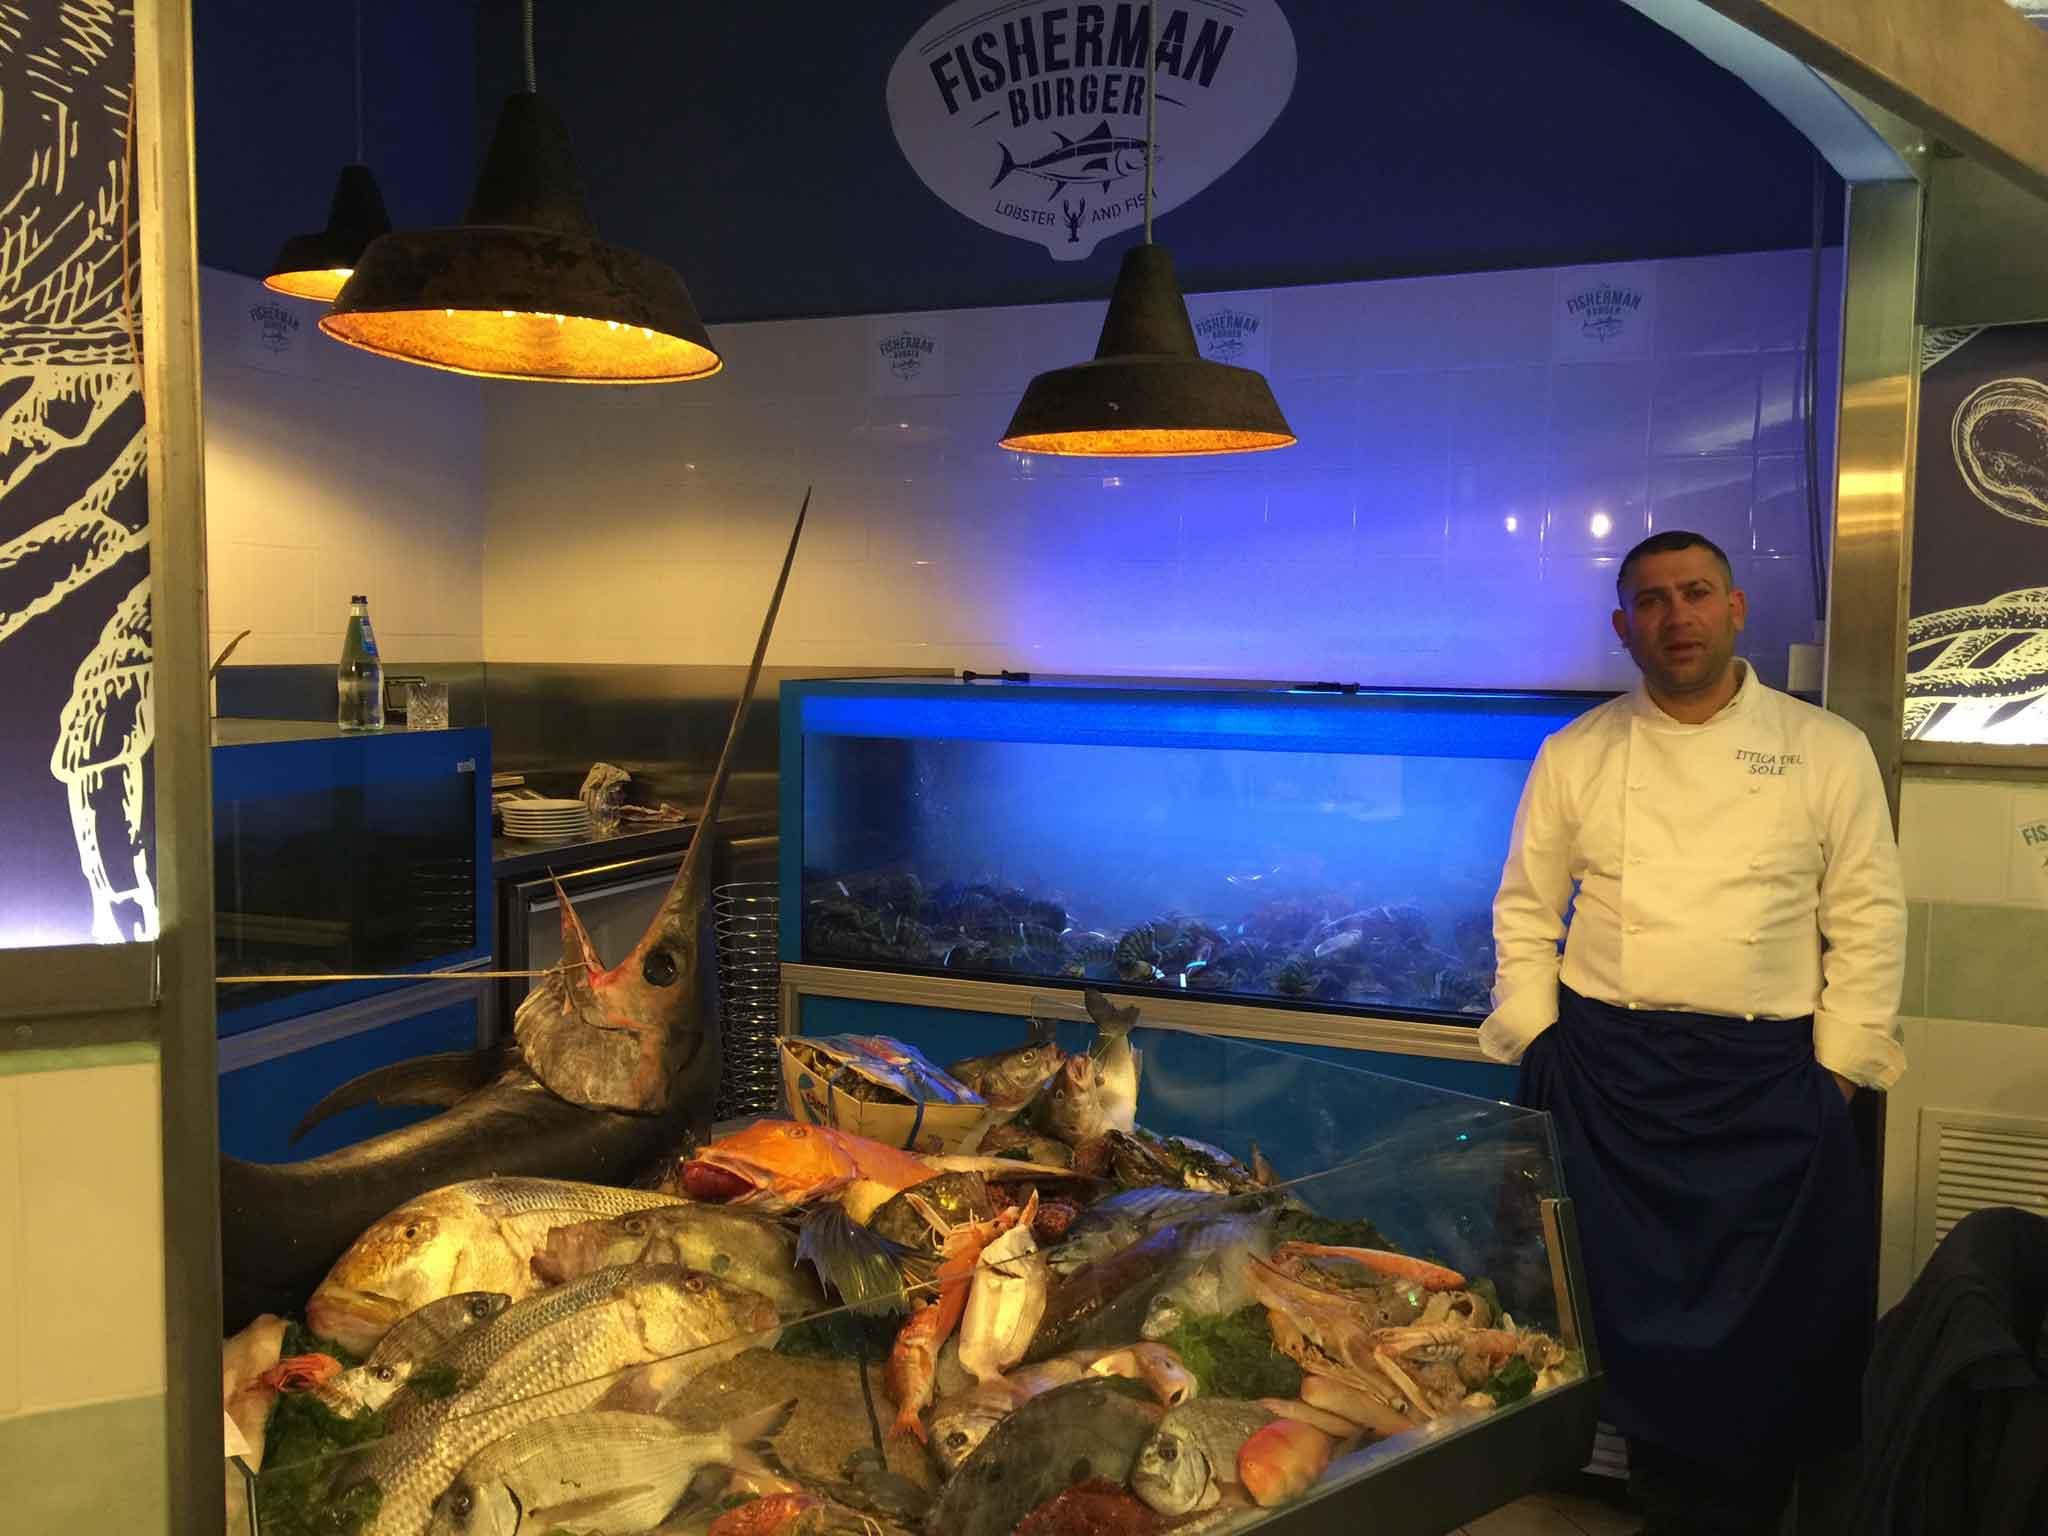 Fisherman Burger banco pesce